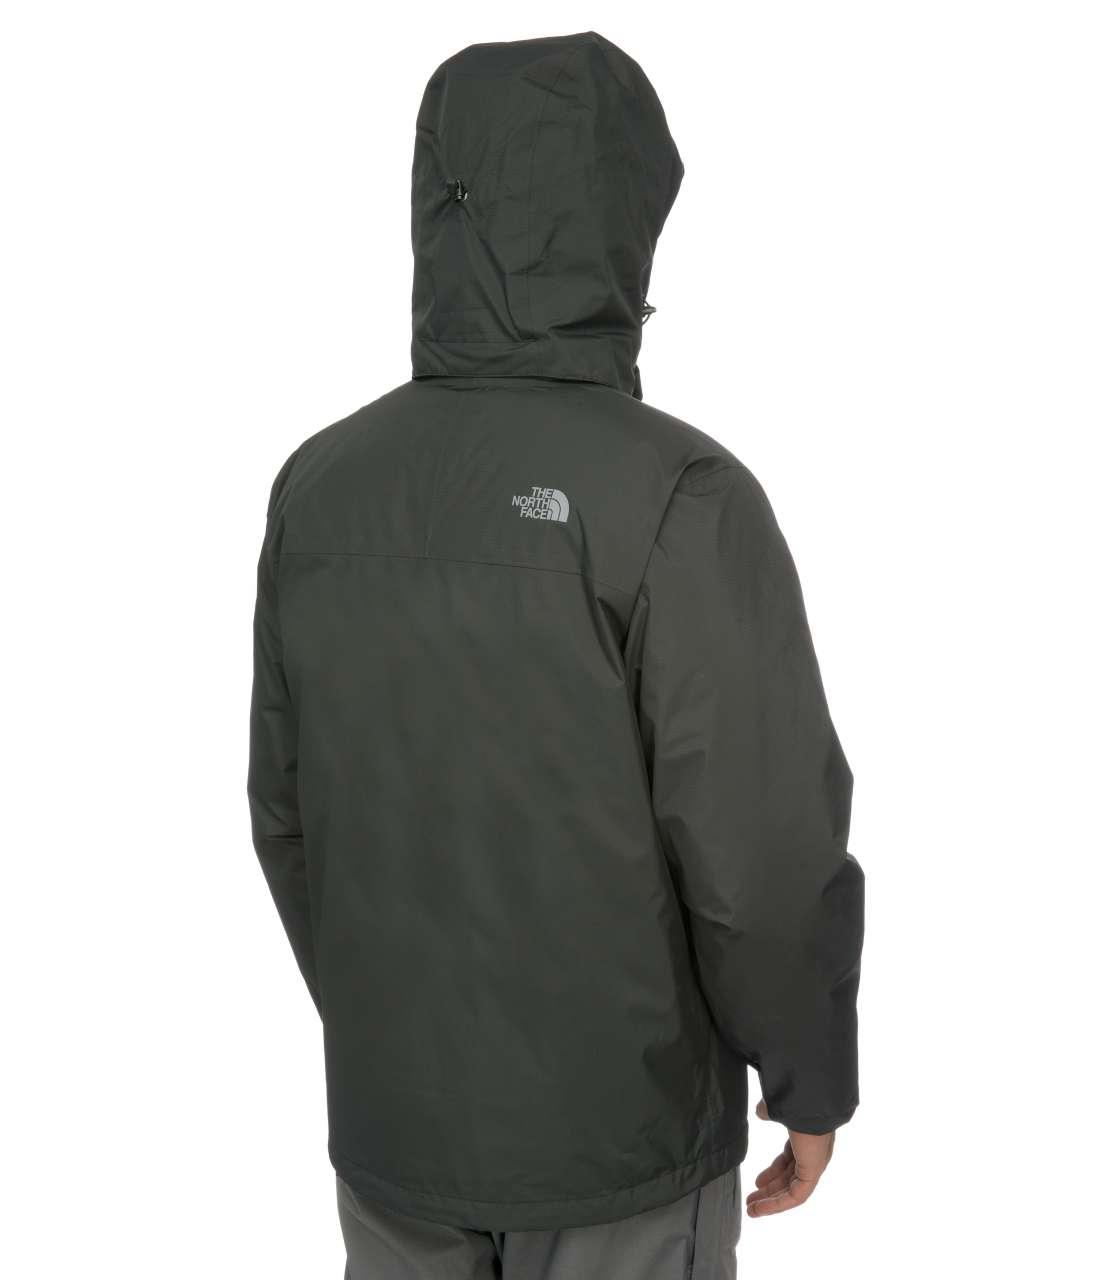 pin the north face mountain light rain jacket men s on pinterest. Black Bedroom Furniture Sets. Home Design Ideas